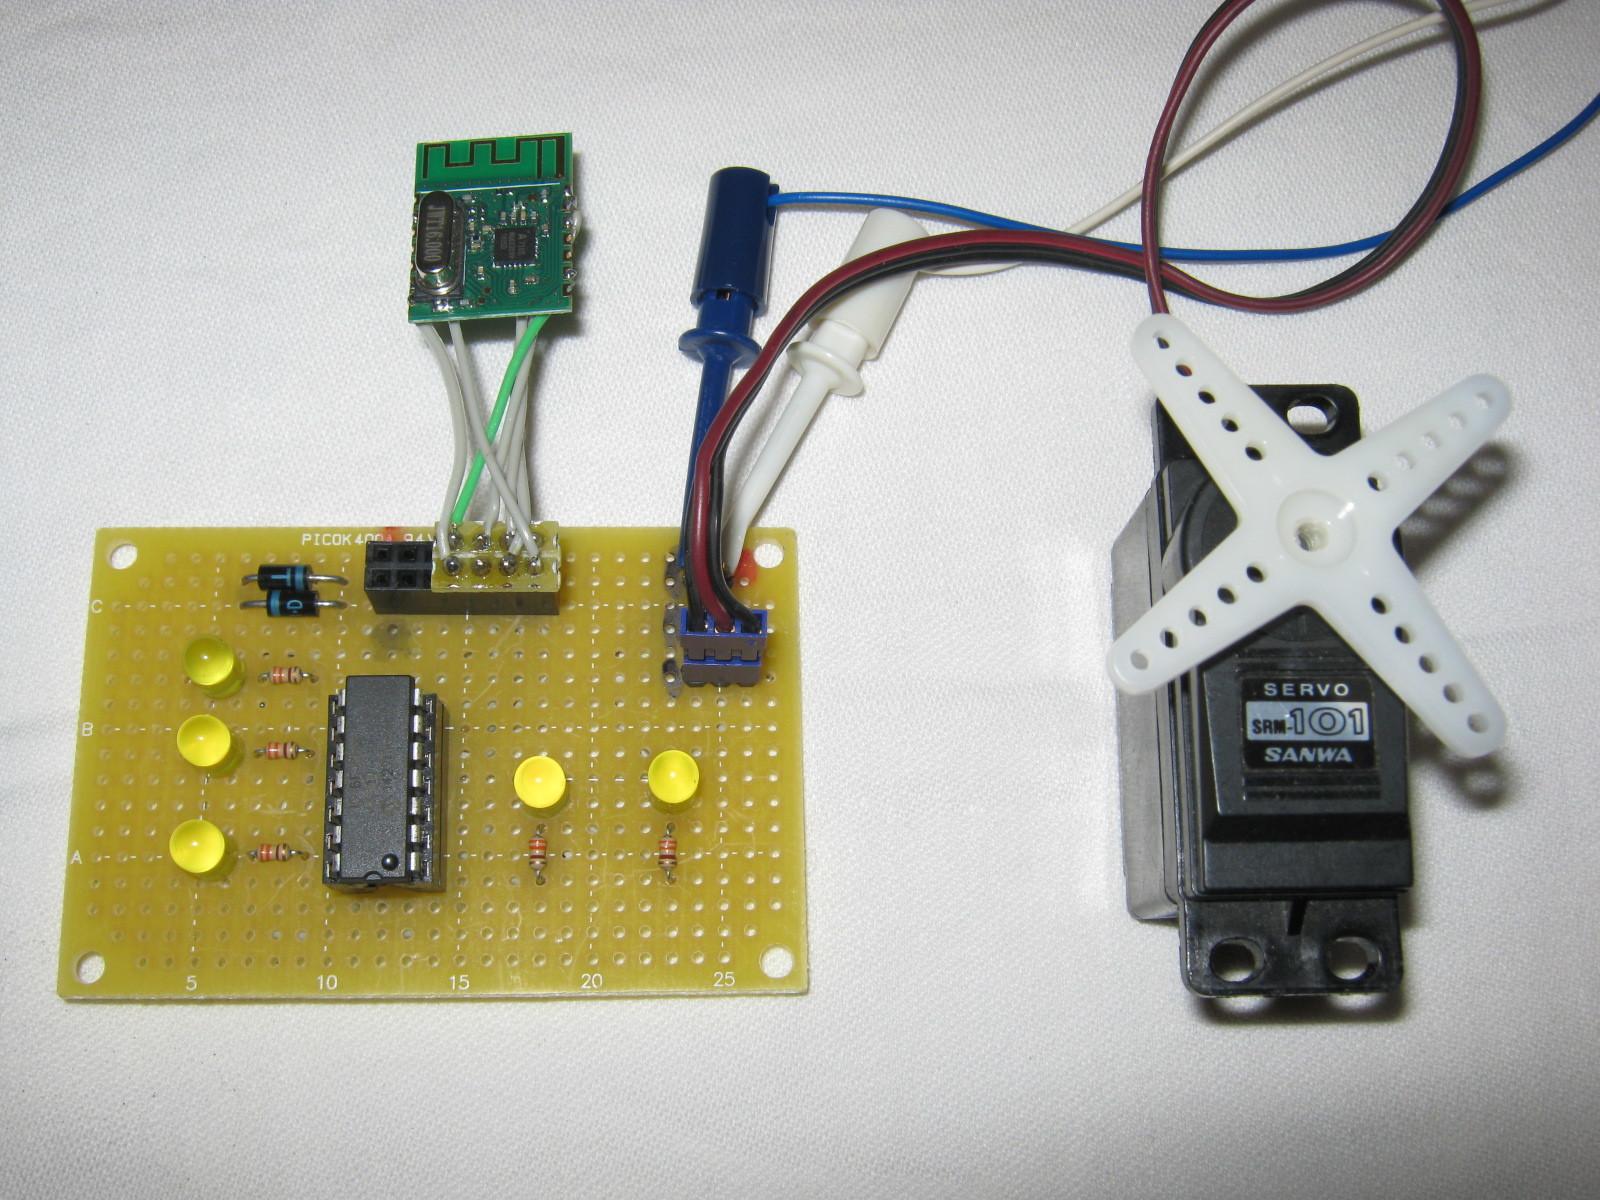 2.4GHzラジコン用ファームウェア製作(A7105)受信側